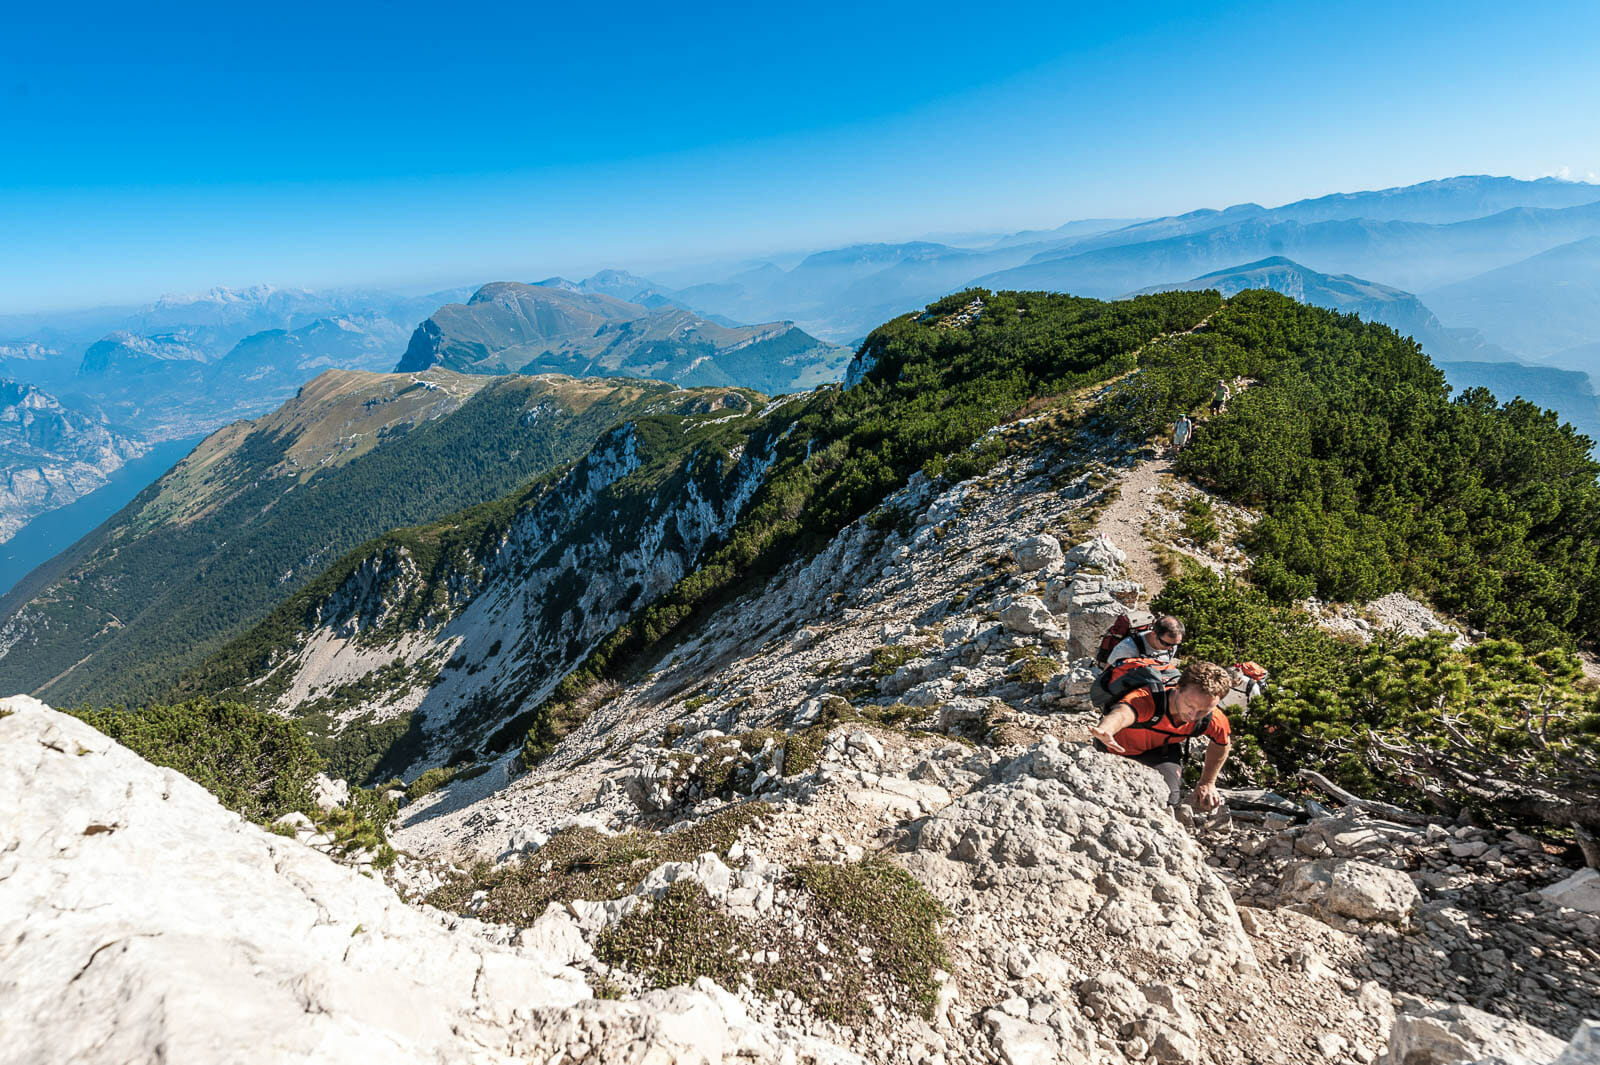 monte baldo peaks trekking route to cima pozzette